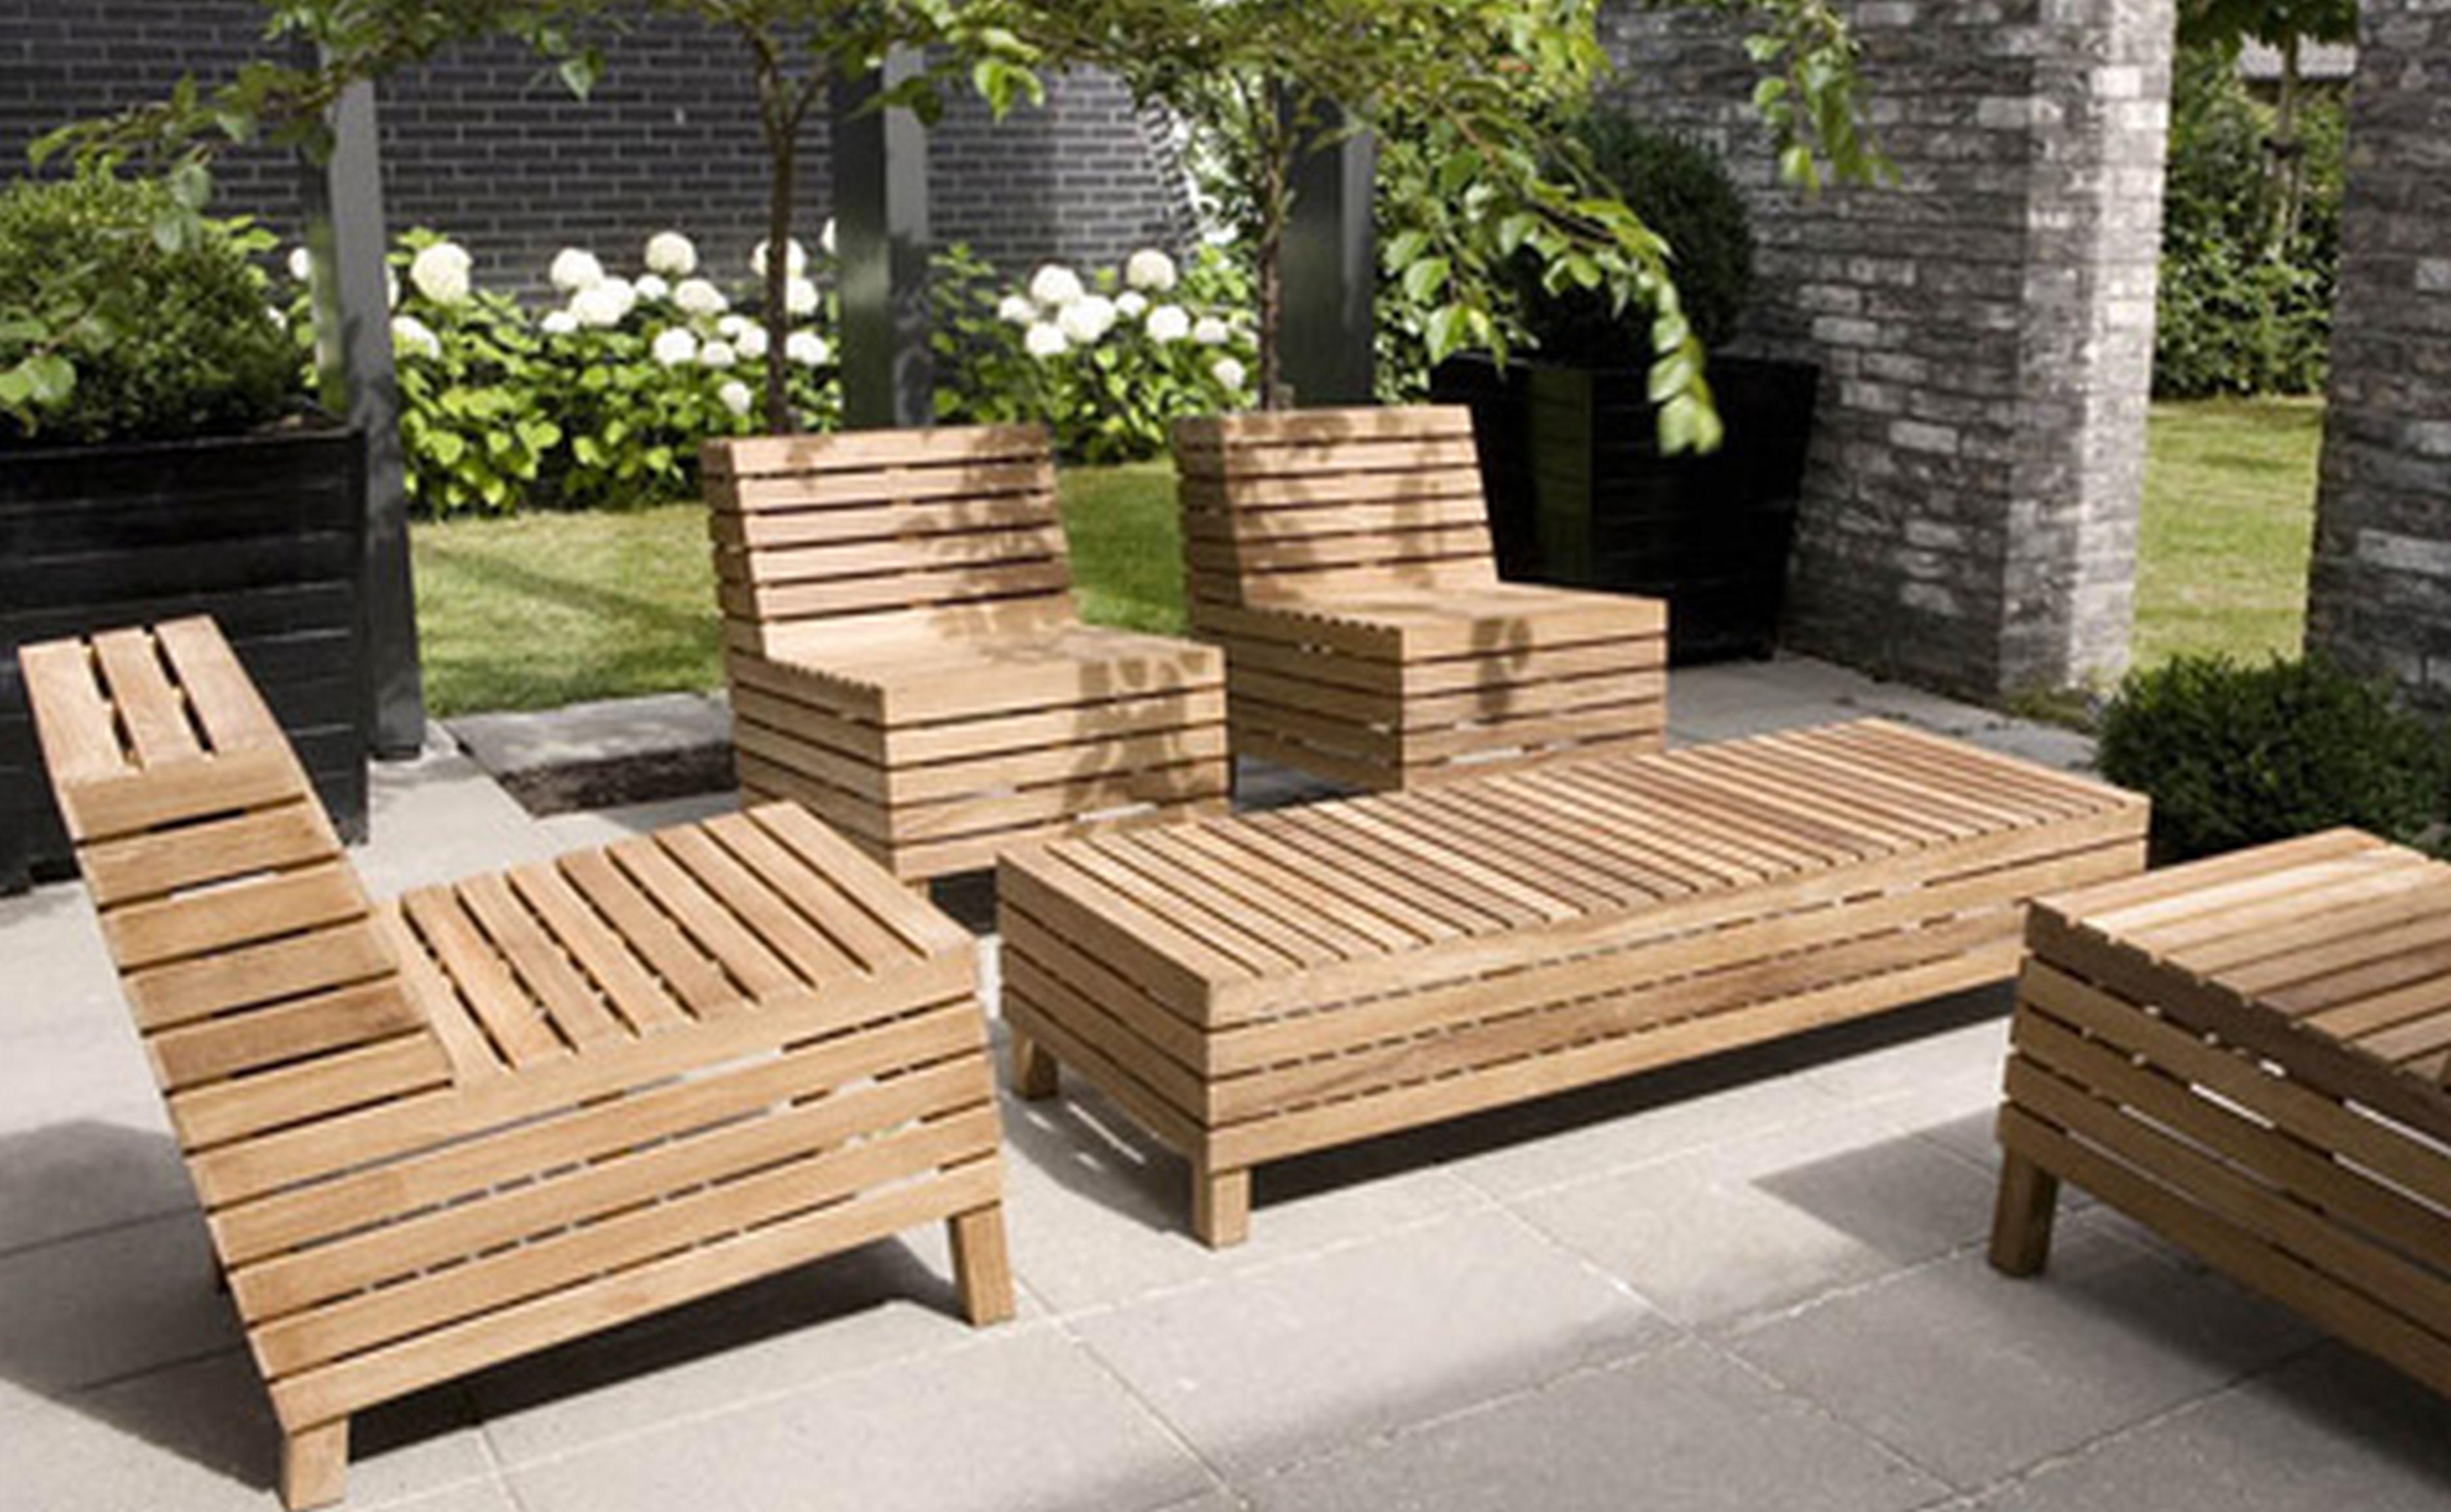 Wooden garden furniture image 15 cool little vegetable garden plans BIODRUJ